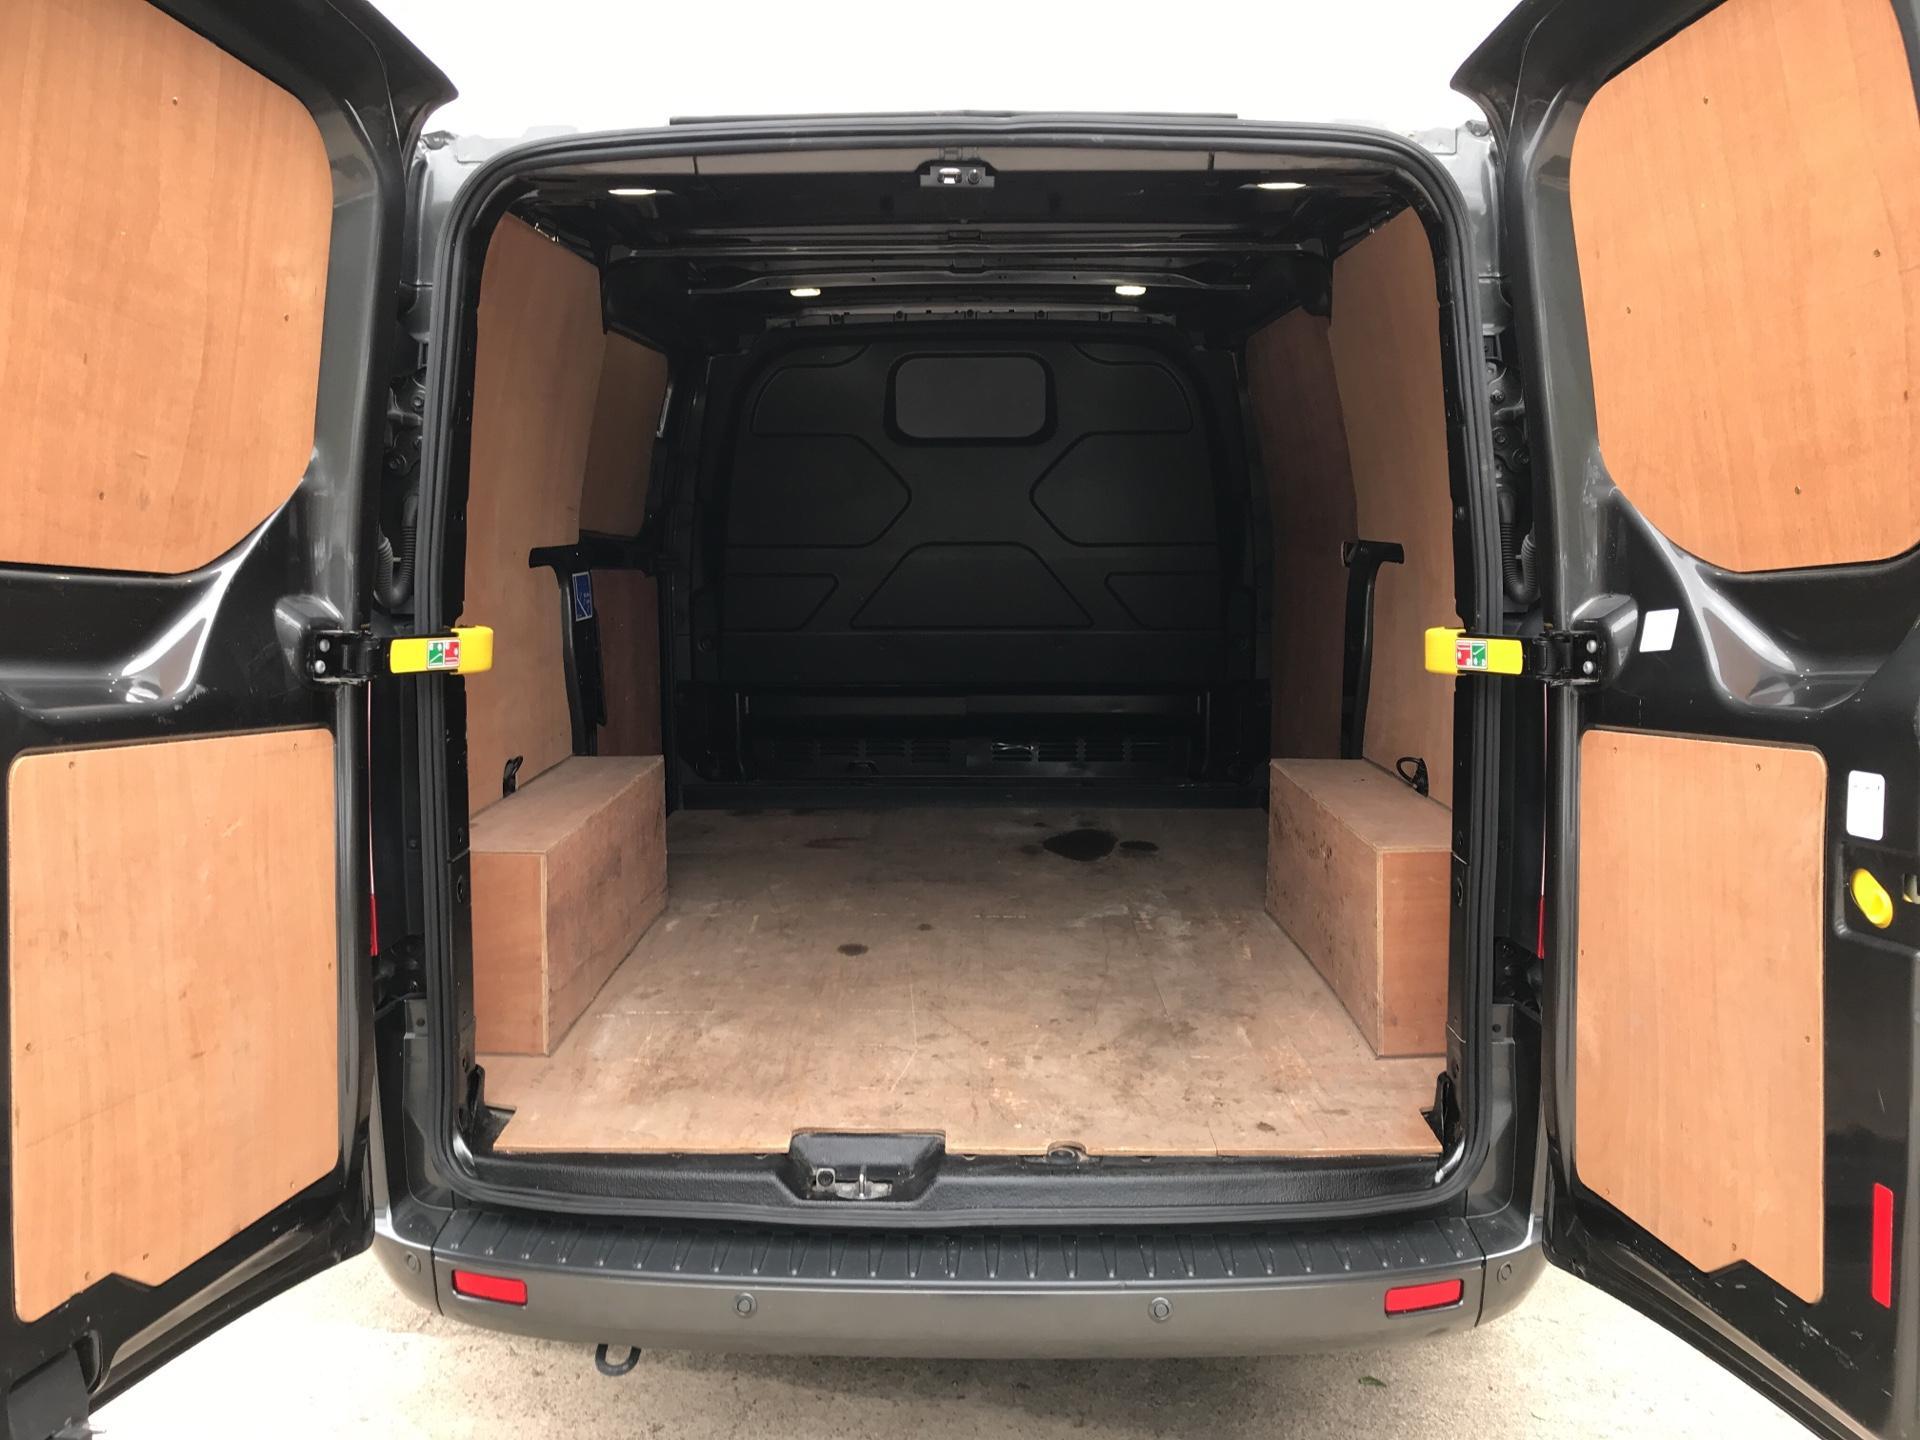 2016 Ford Transit Custom 290 L1 DIESEL FWD 2.2 TDCI 125PS LOW ROOF LIMITED VAN EURO 5 (DV16OKP) Image 15